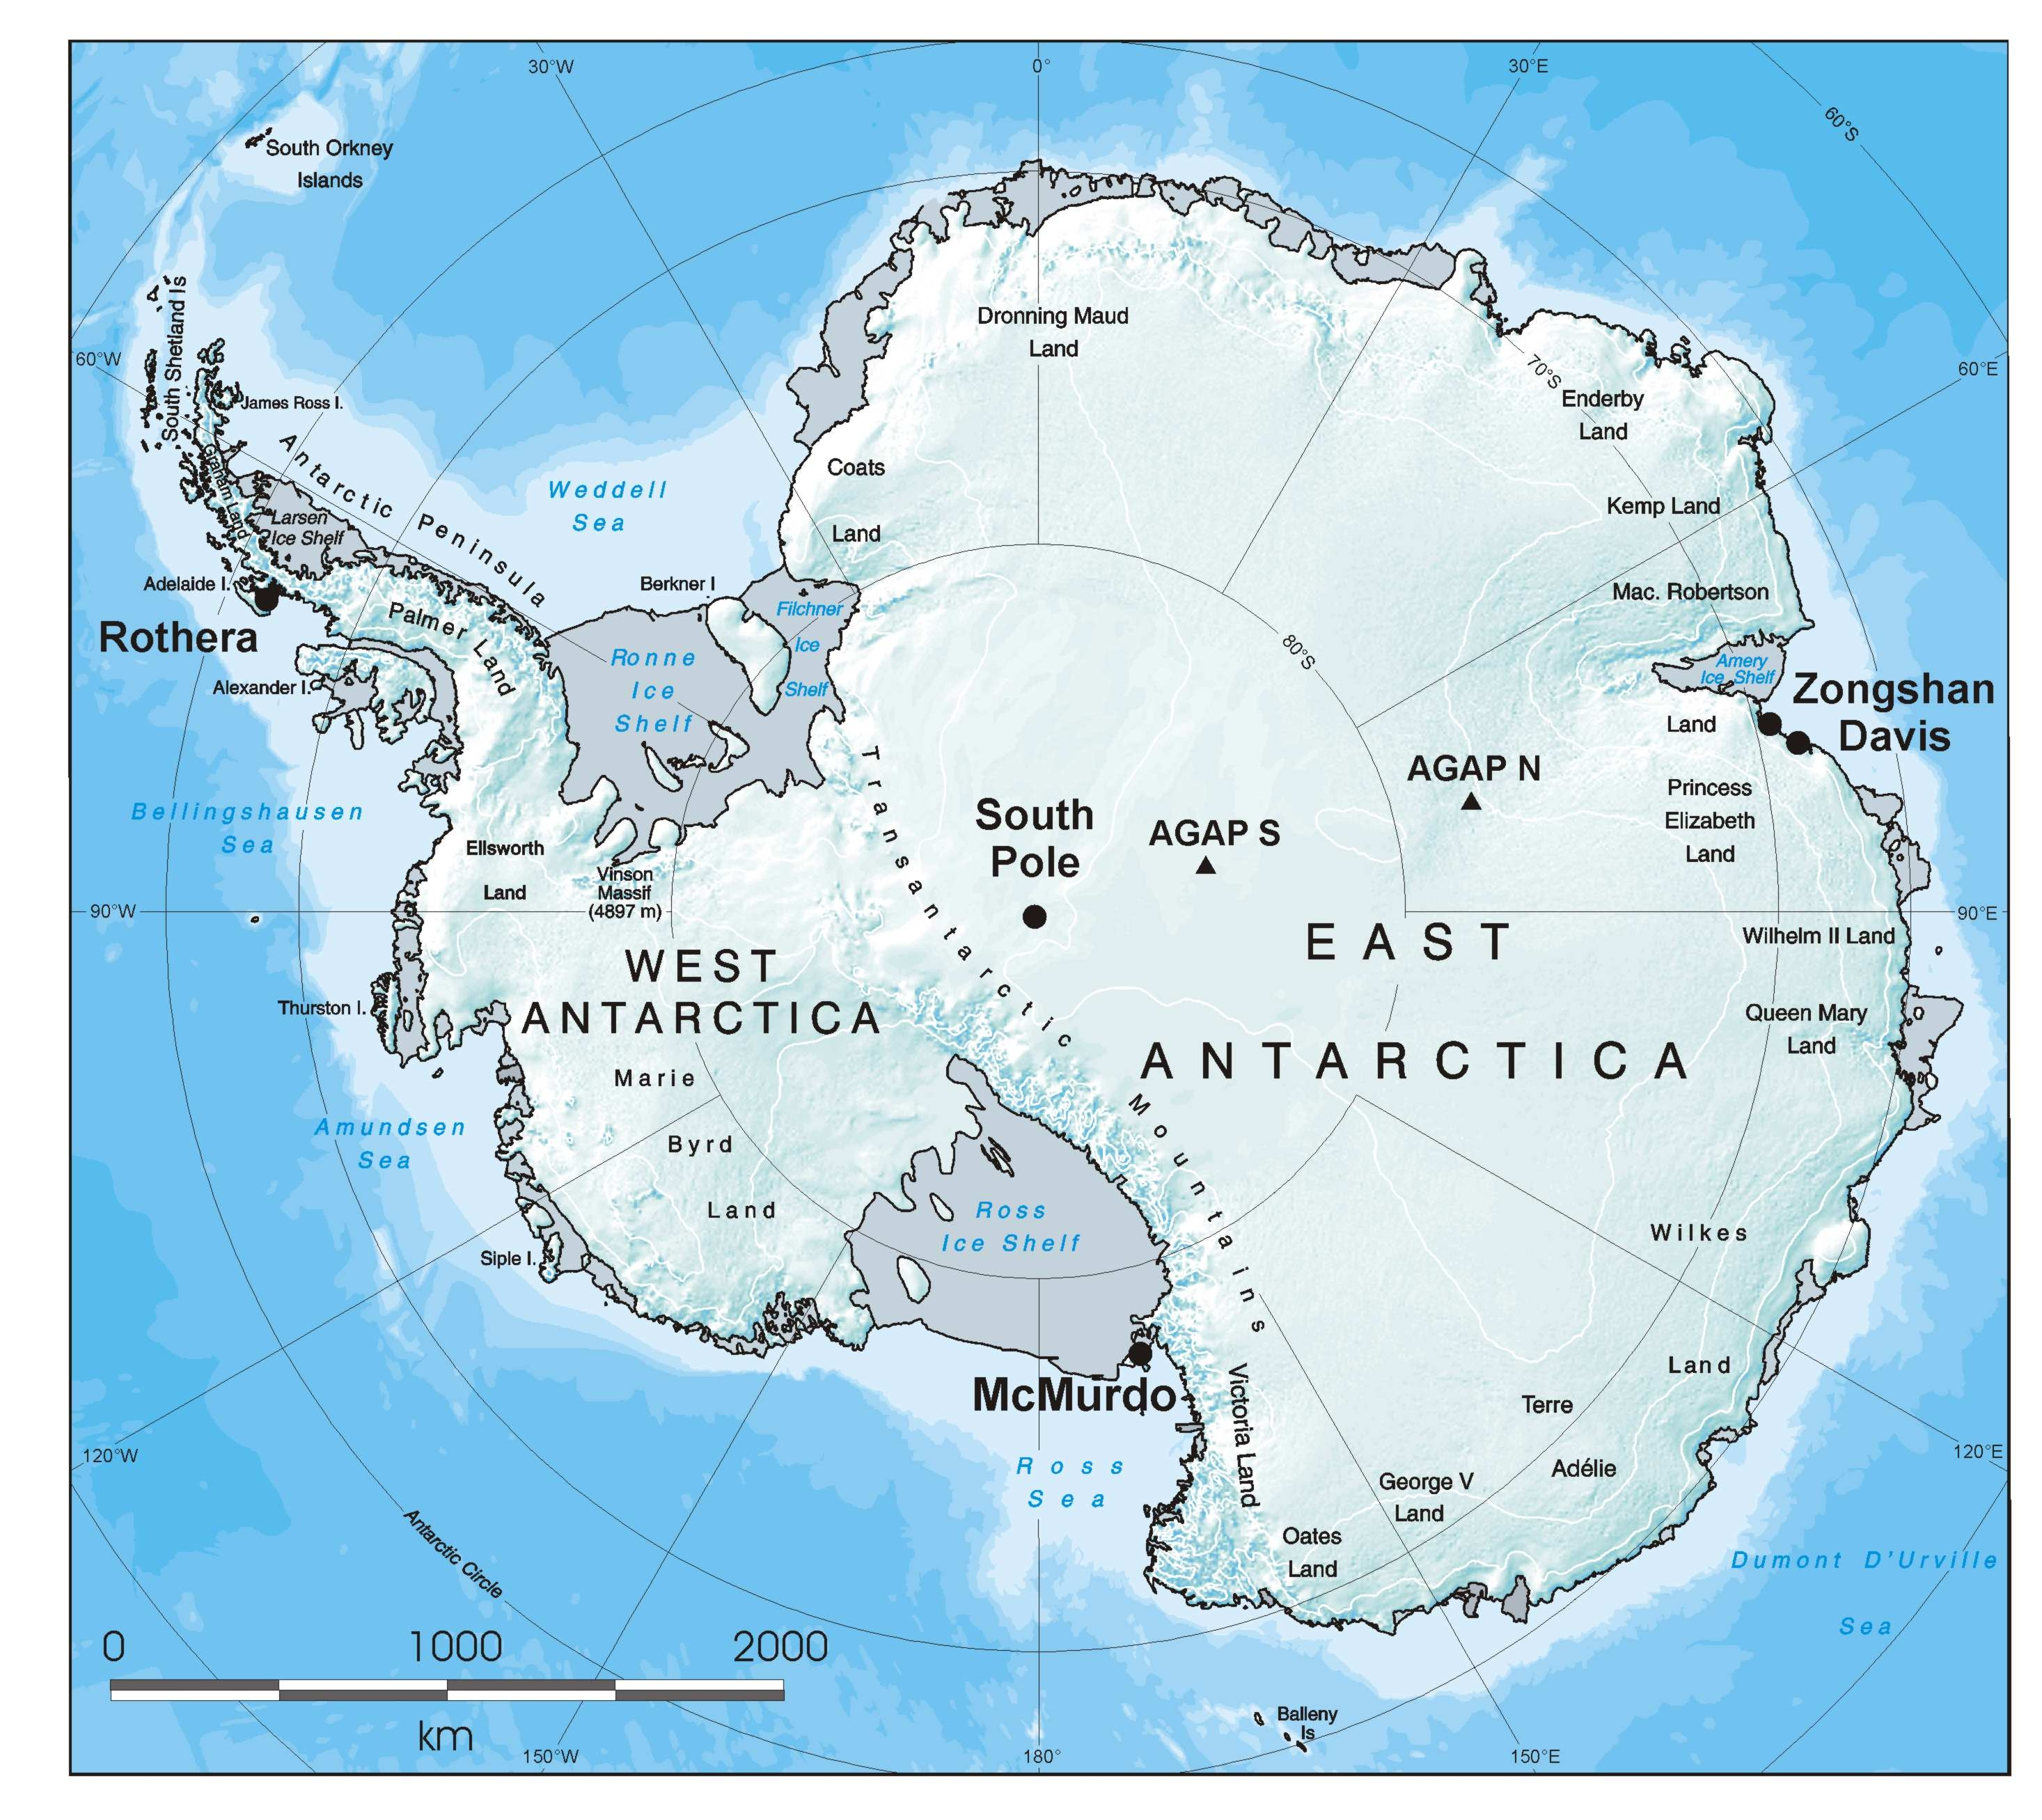 The logistics mission - Project - British Antarctic Survey